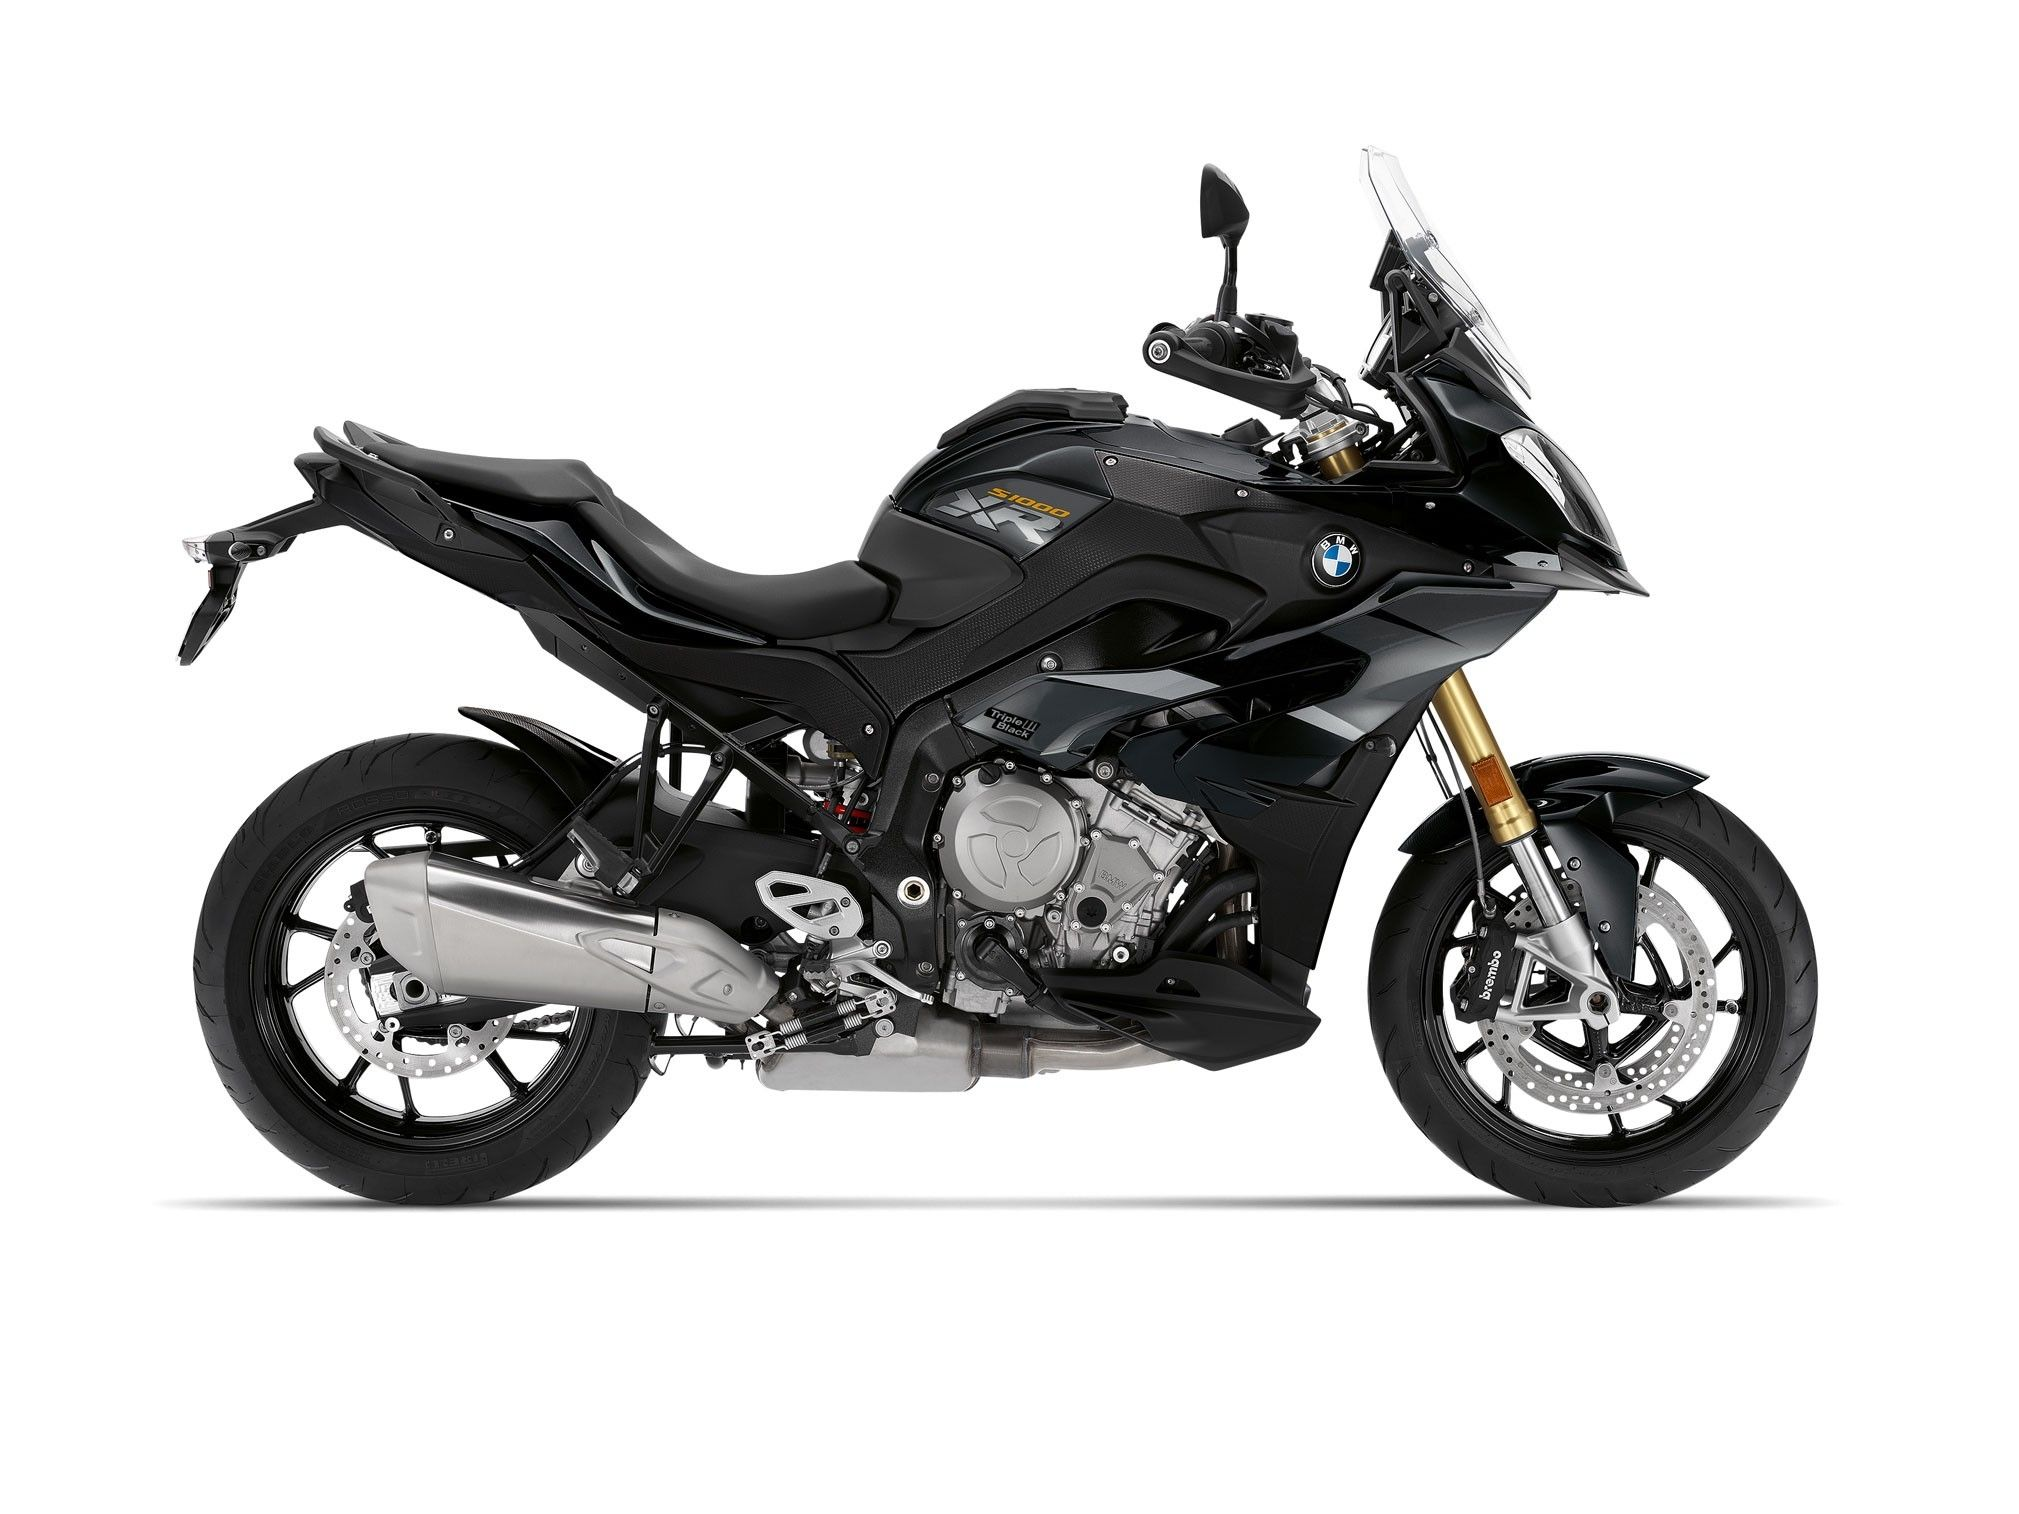 Bmw S1000xr 2019 Release Date And Specs Bmw Motorrad Bmw Bmw S